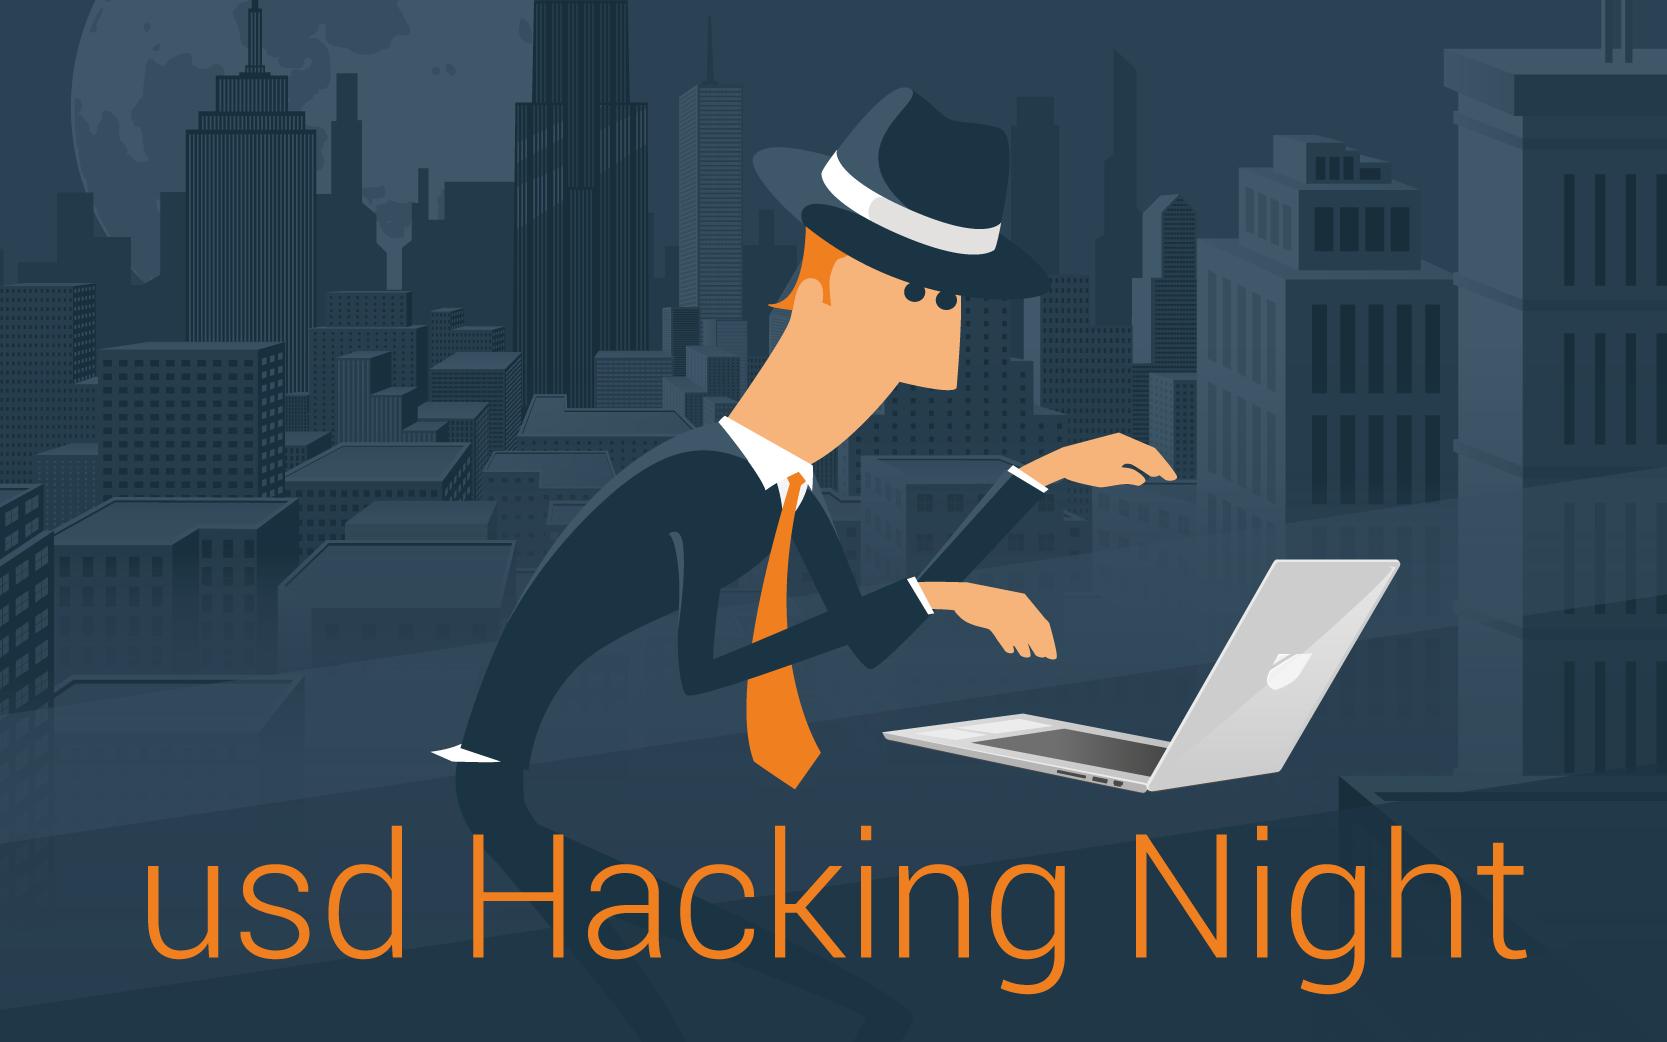 usd Hacking Night – Sommer 2019